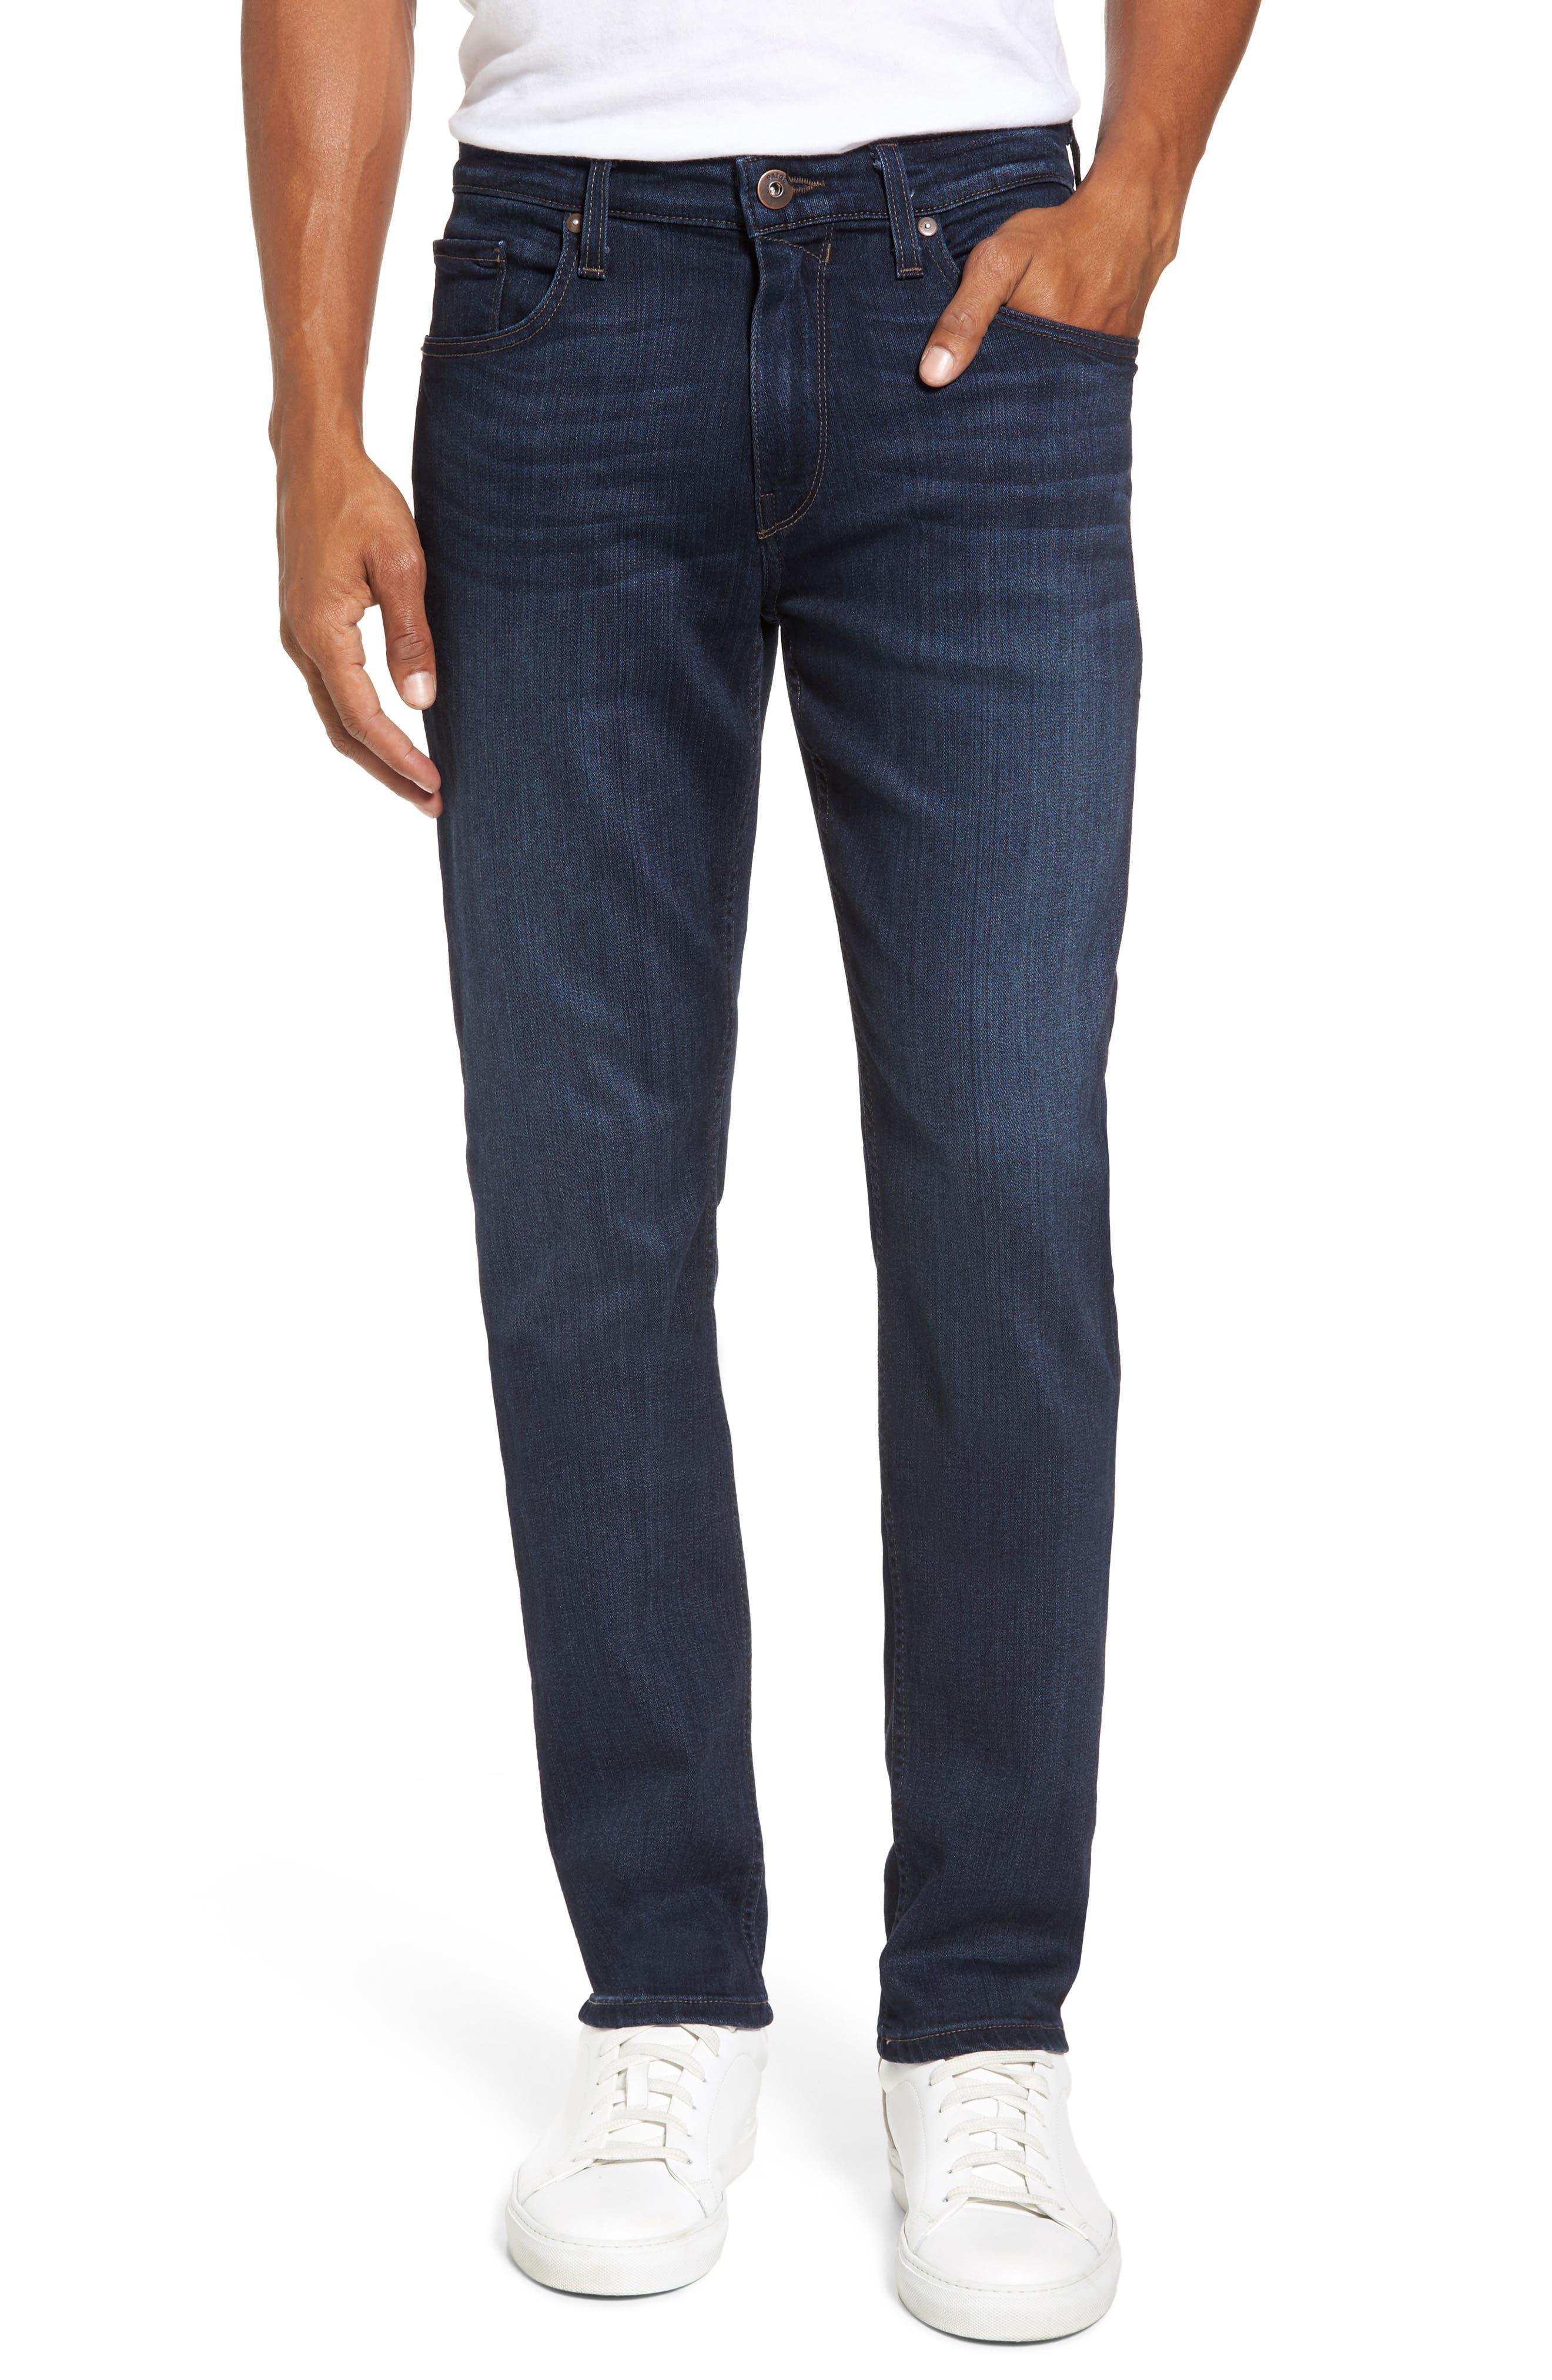 Alternate Image 1 Selected - PAIGE Transcend - Federal Slim Straight Leg Jeans (Barron)